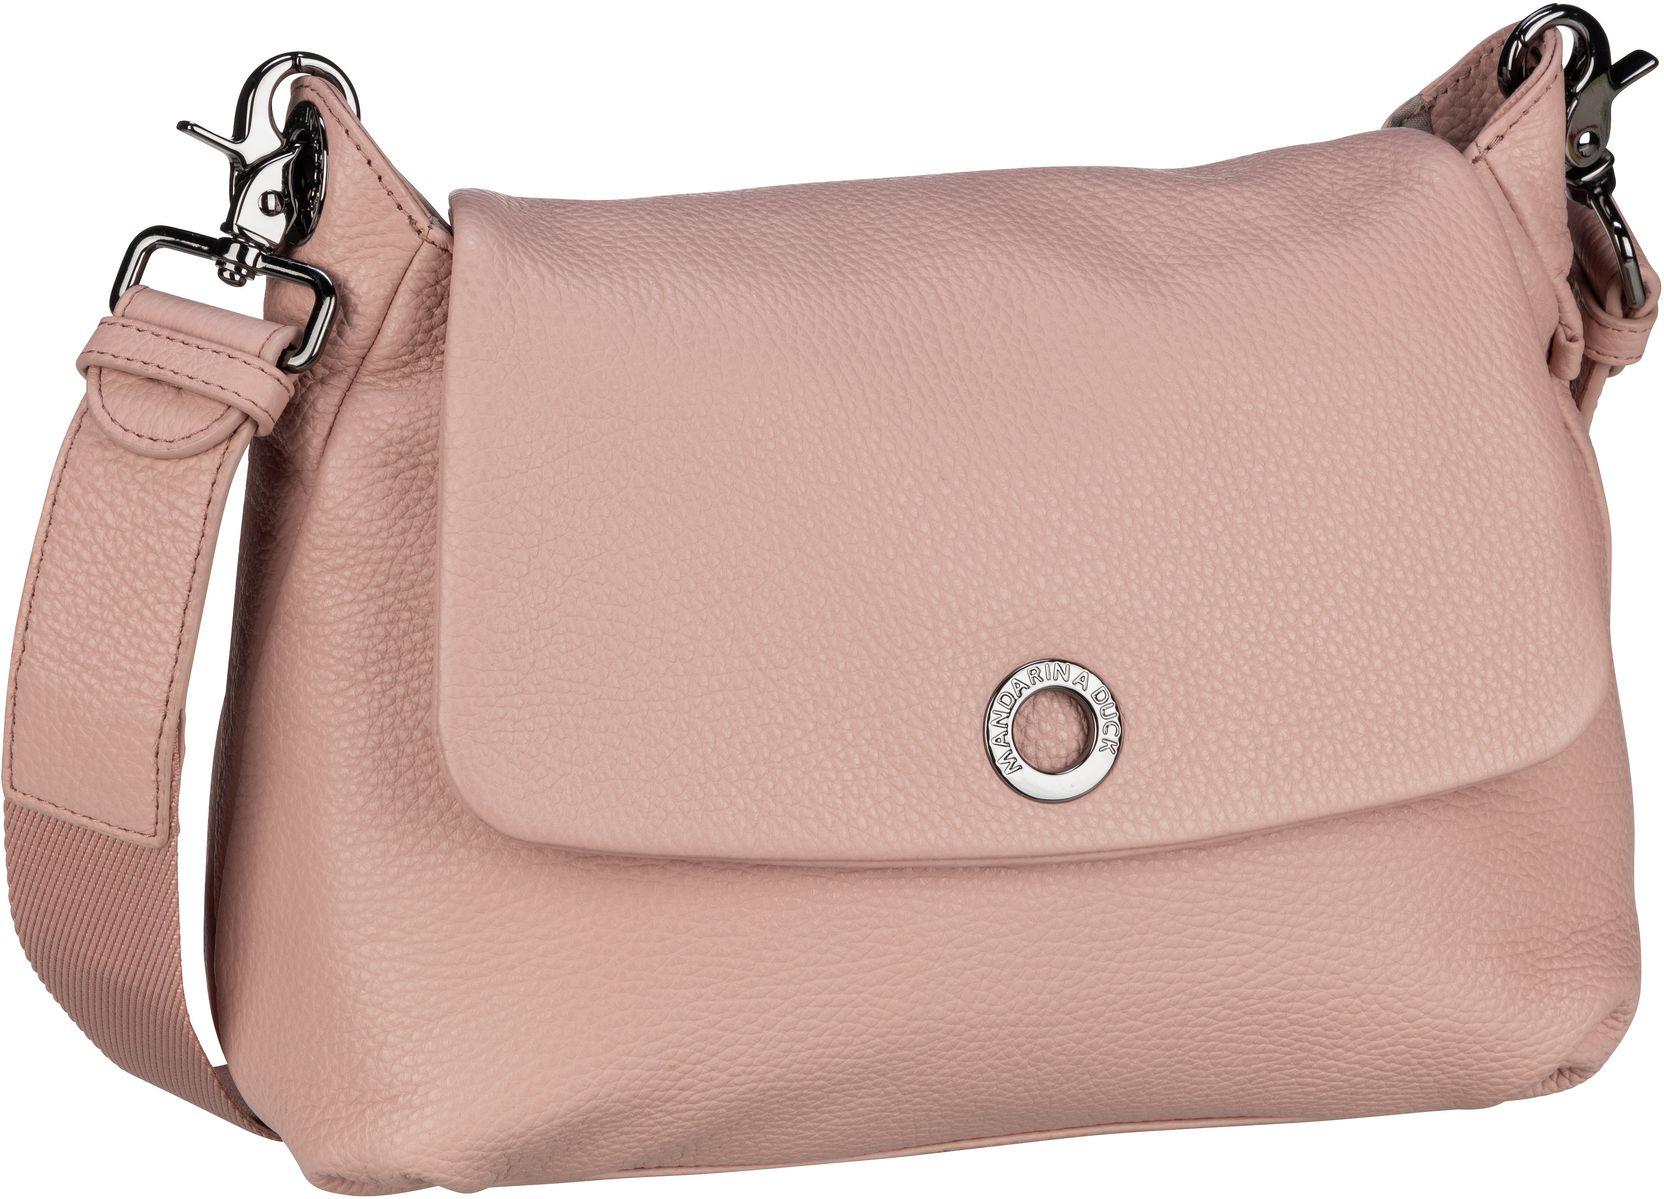 Umhängetasche Mellow Leather Small Shoulder Bag FZT31 Rose Dawn